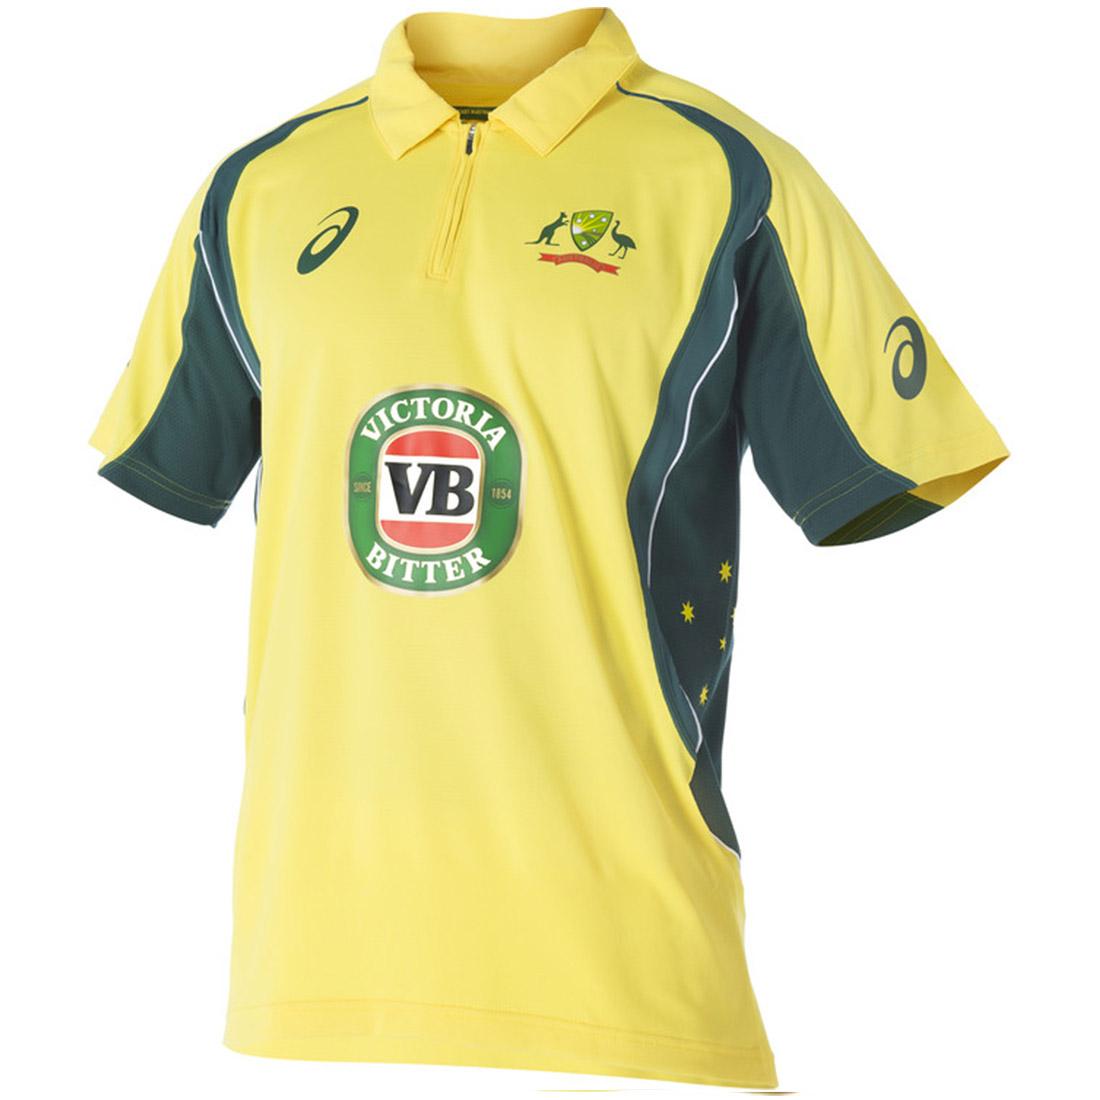 2016/17 Australian Cricket ODI Shirt – Mens – Your Jersey